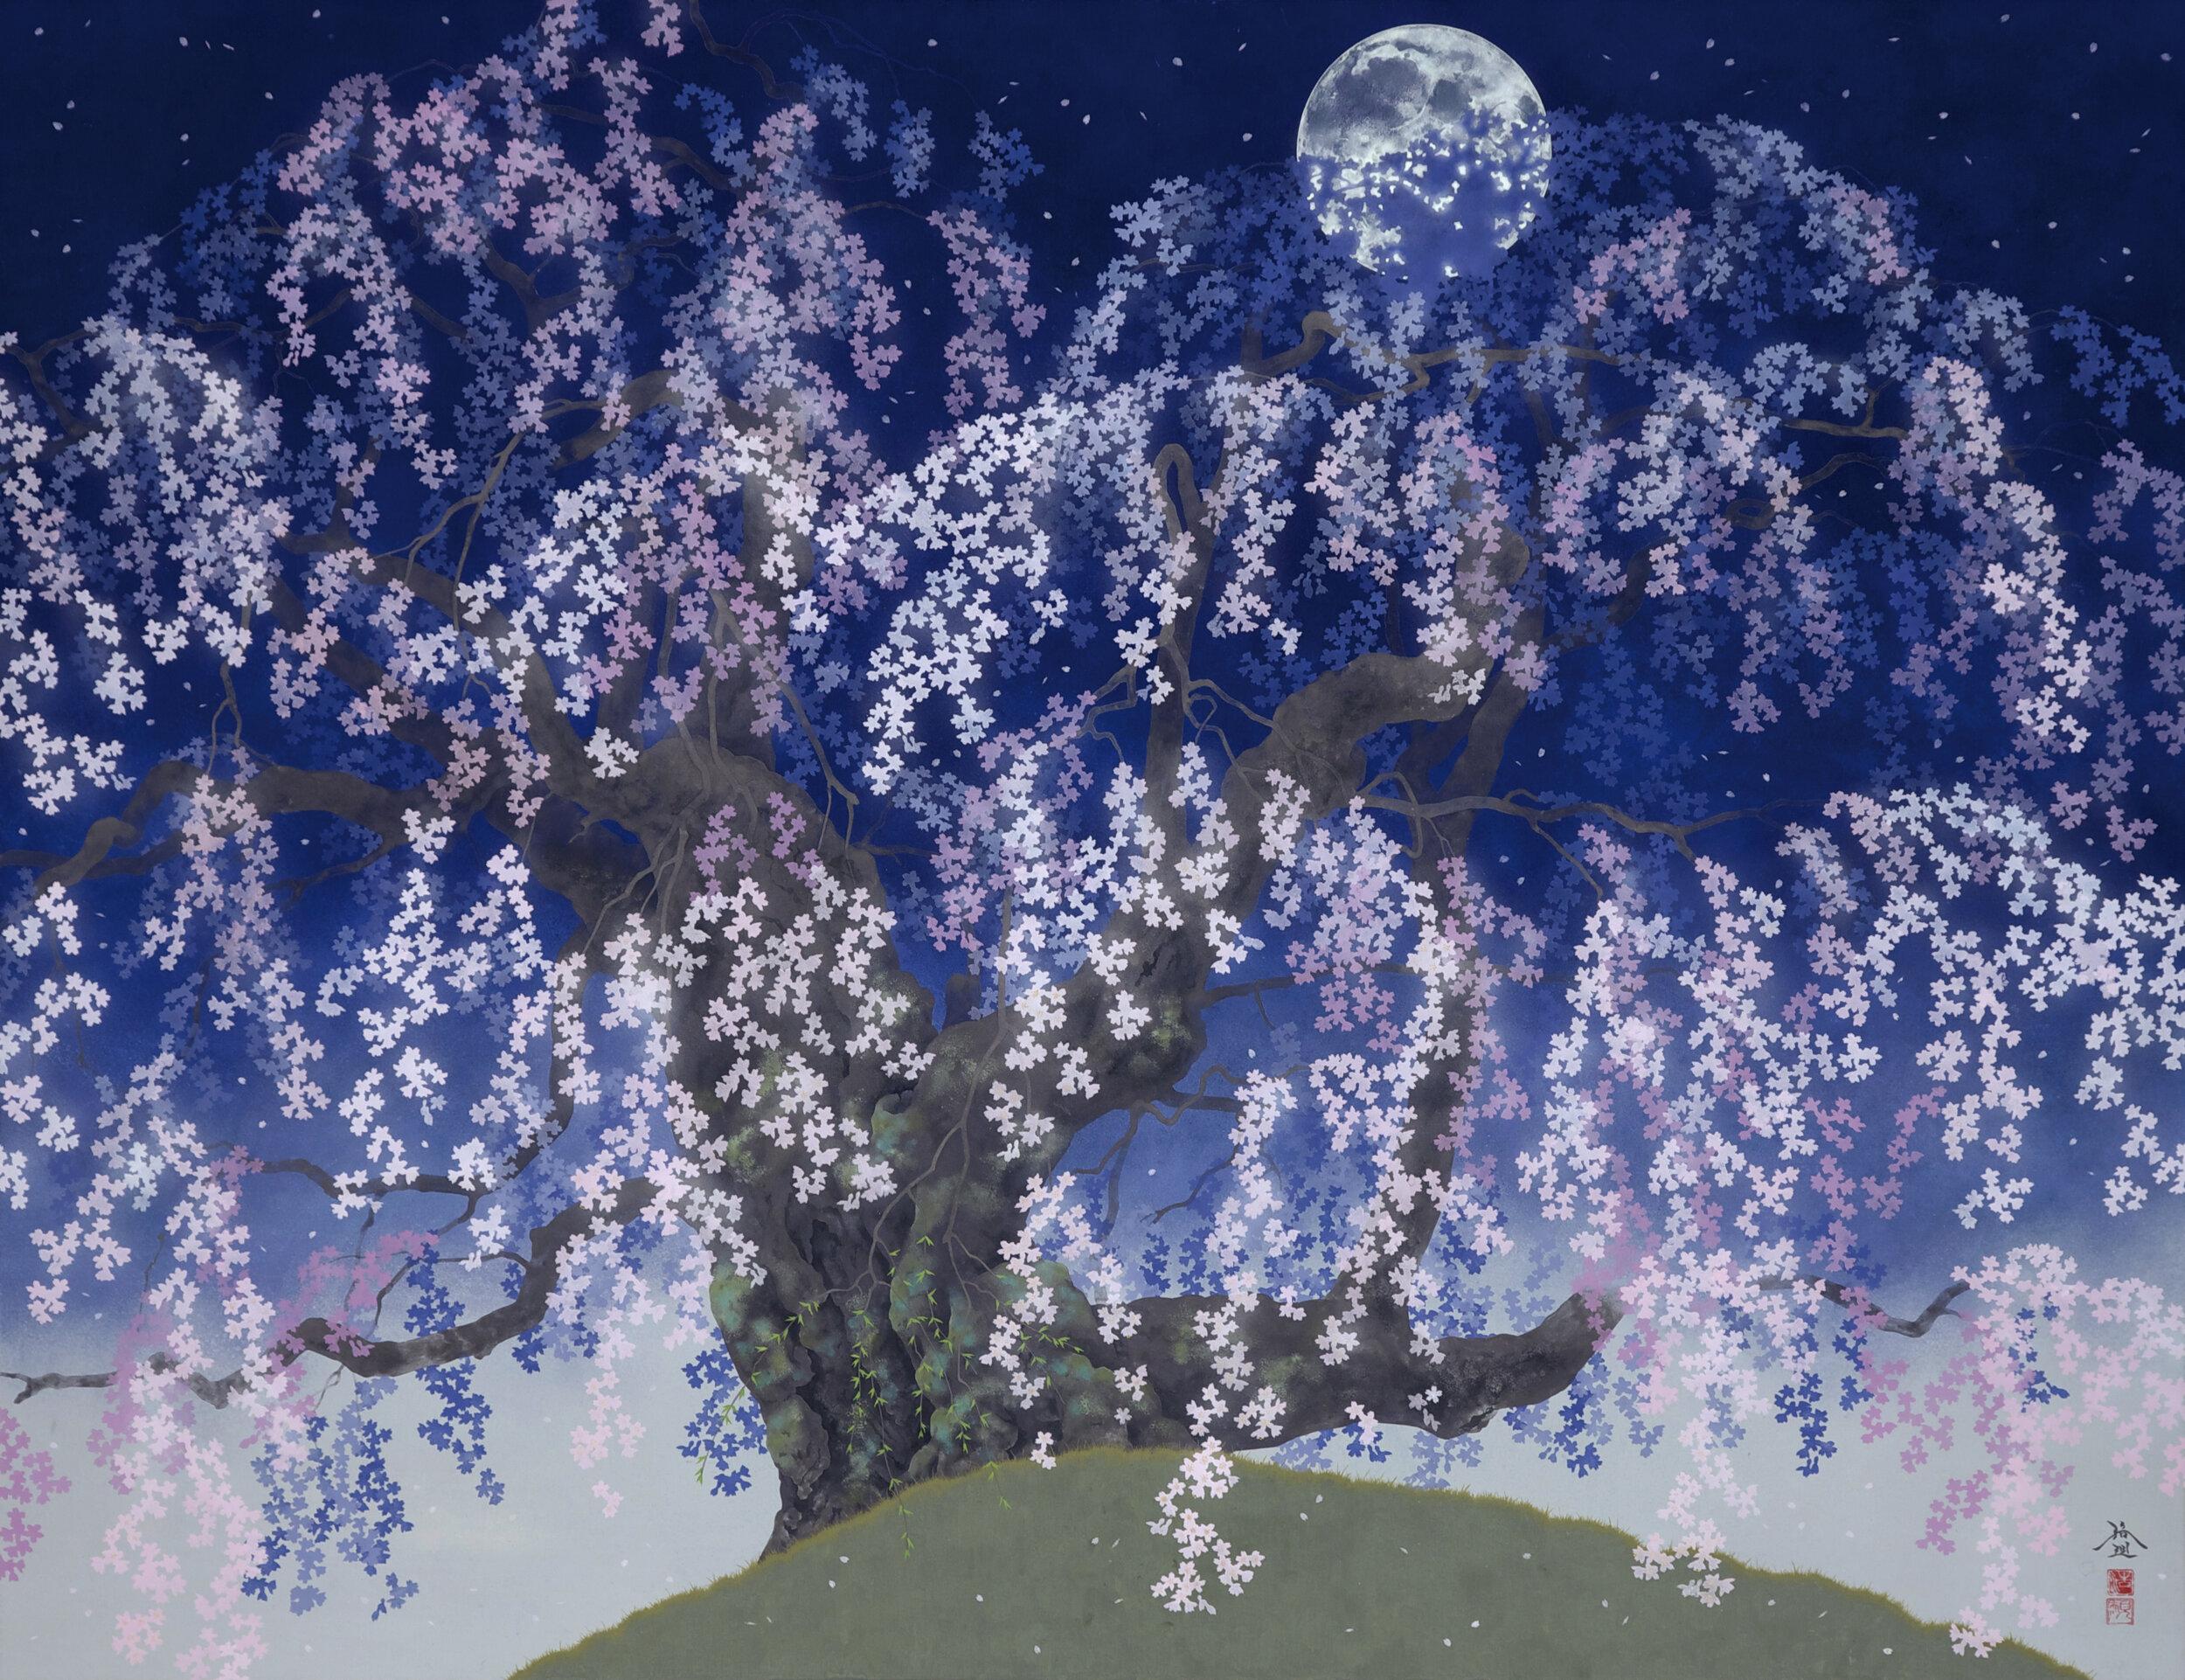 Hiroki takahashi 'Cherry blossoms on a moonlit night' 2016